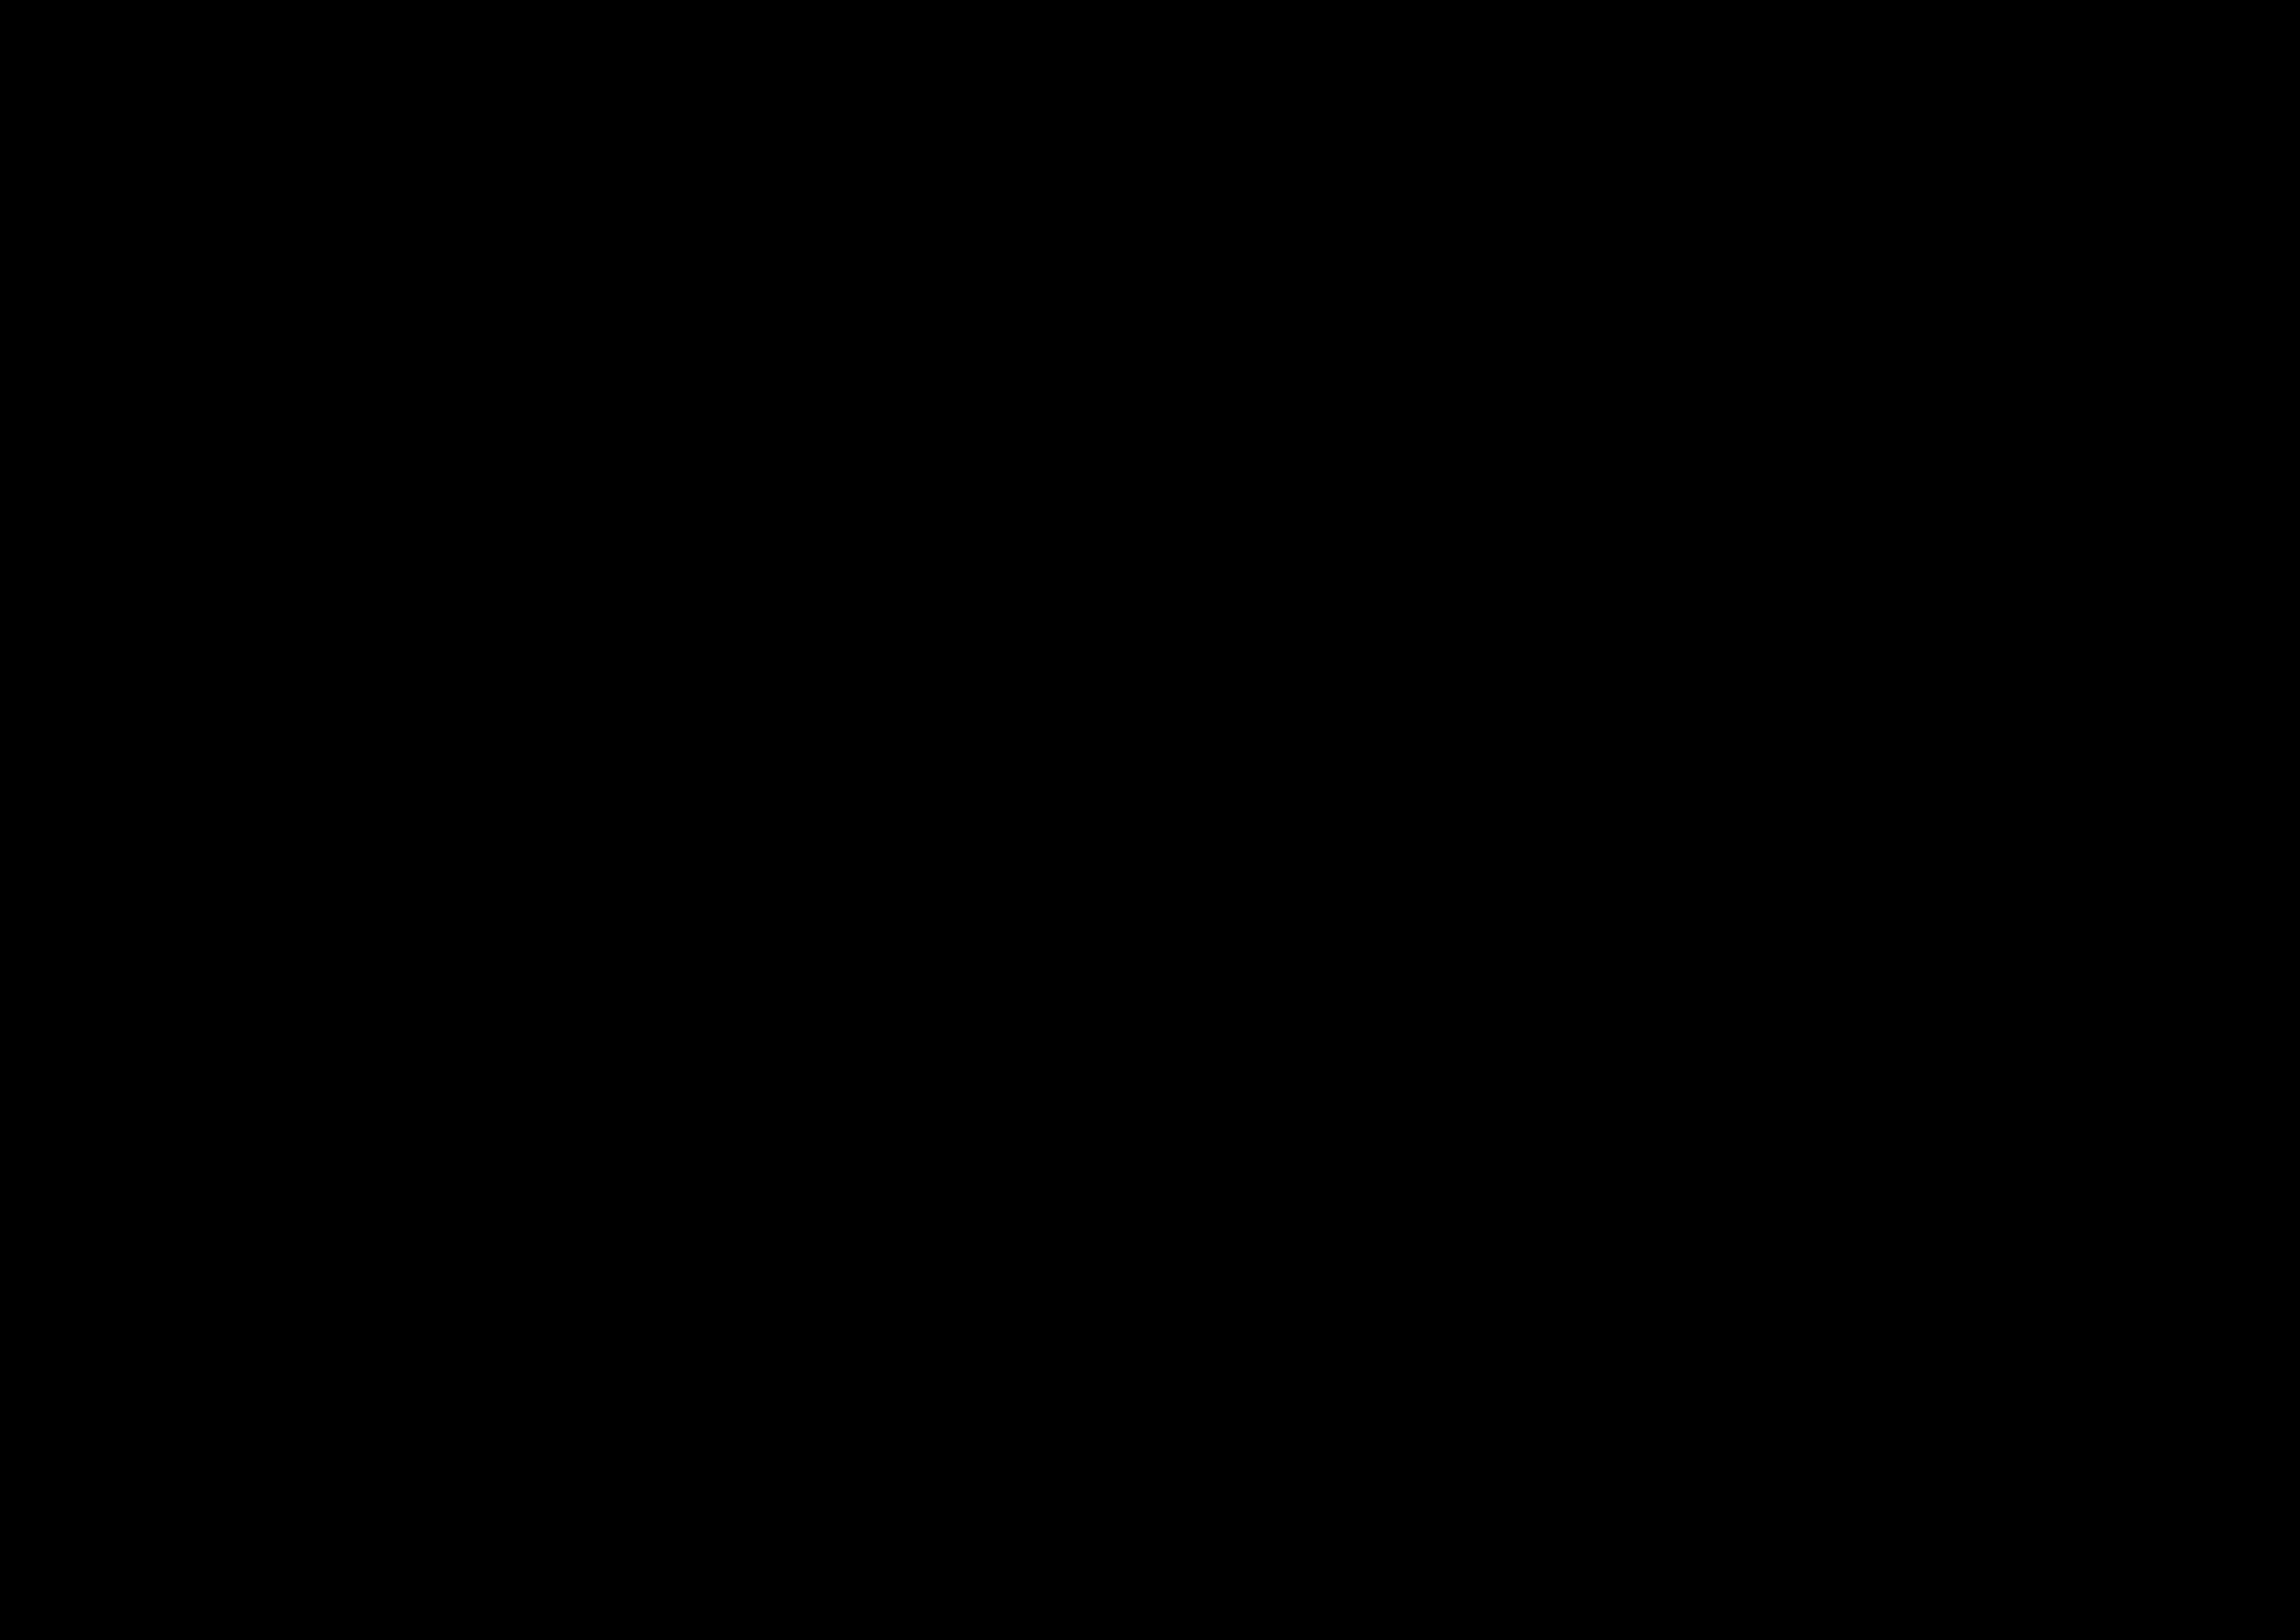 Premium_logo_black_FIN.png